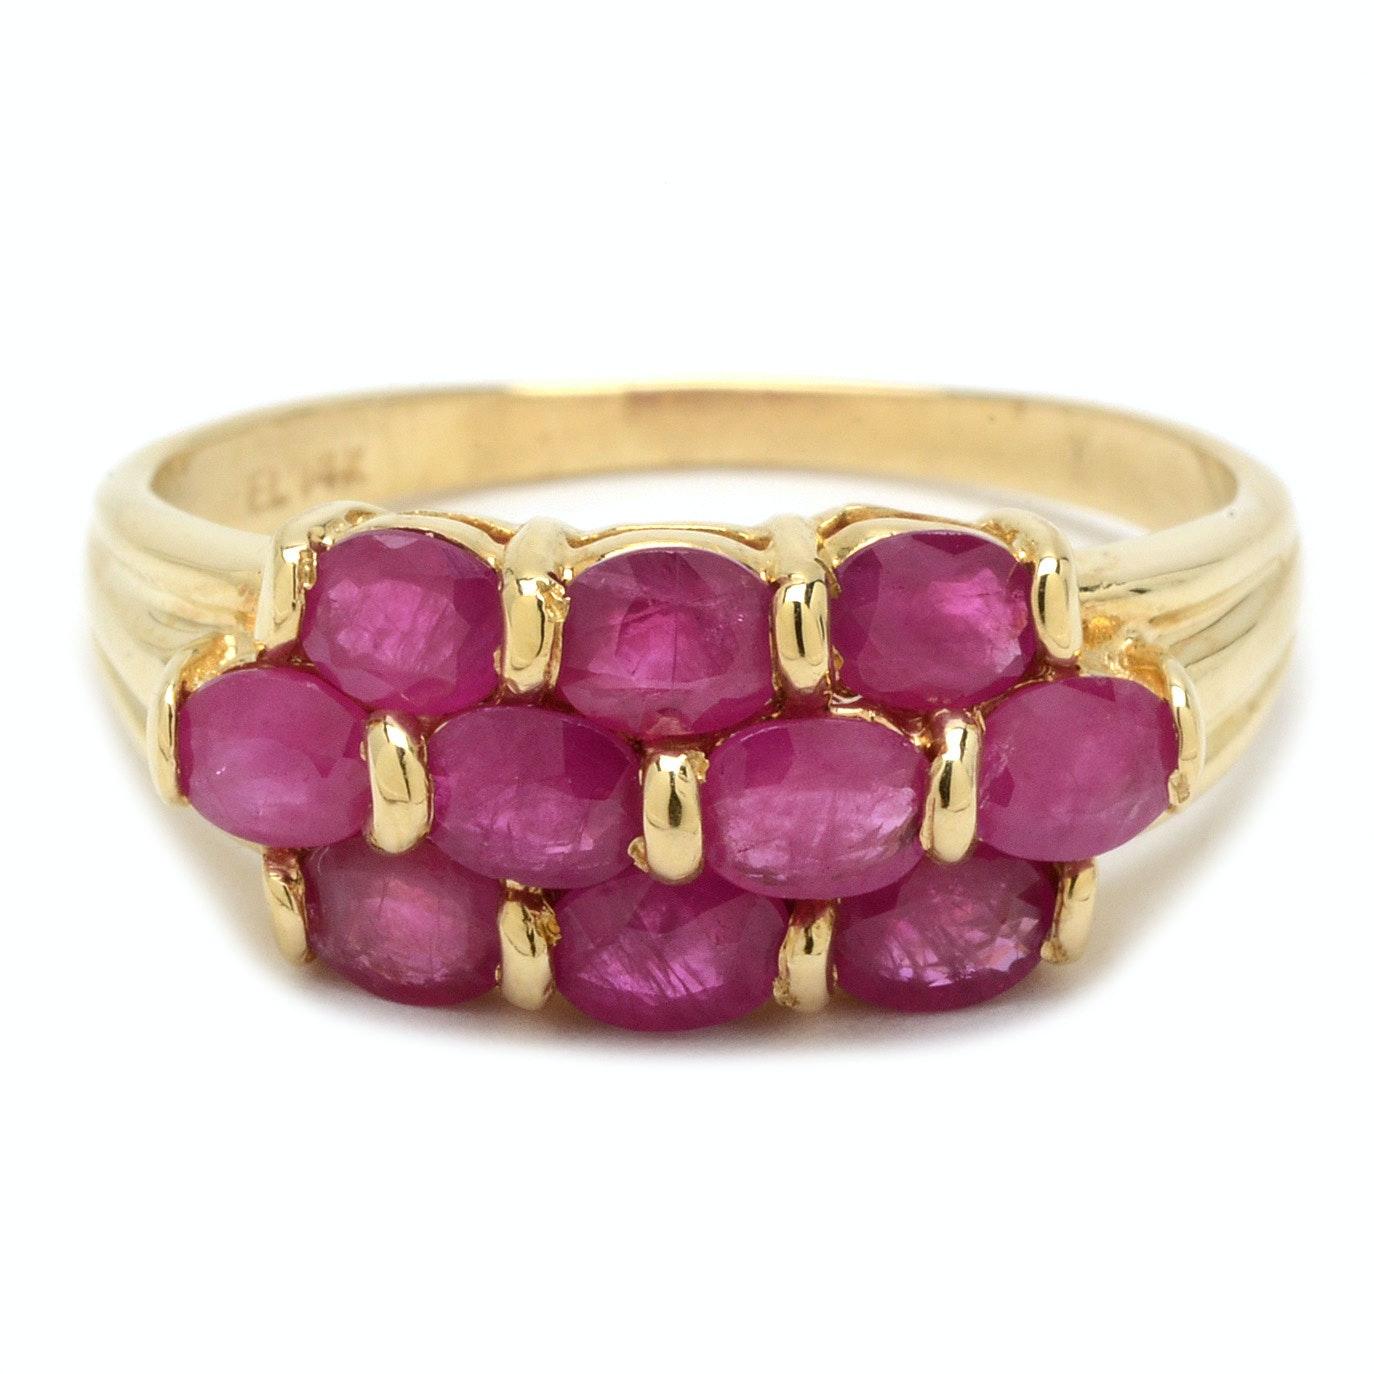 14K Yellow Gold Ruby Ring